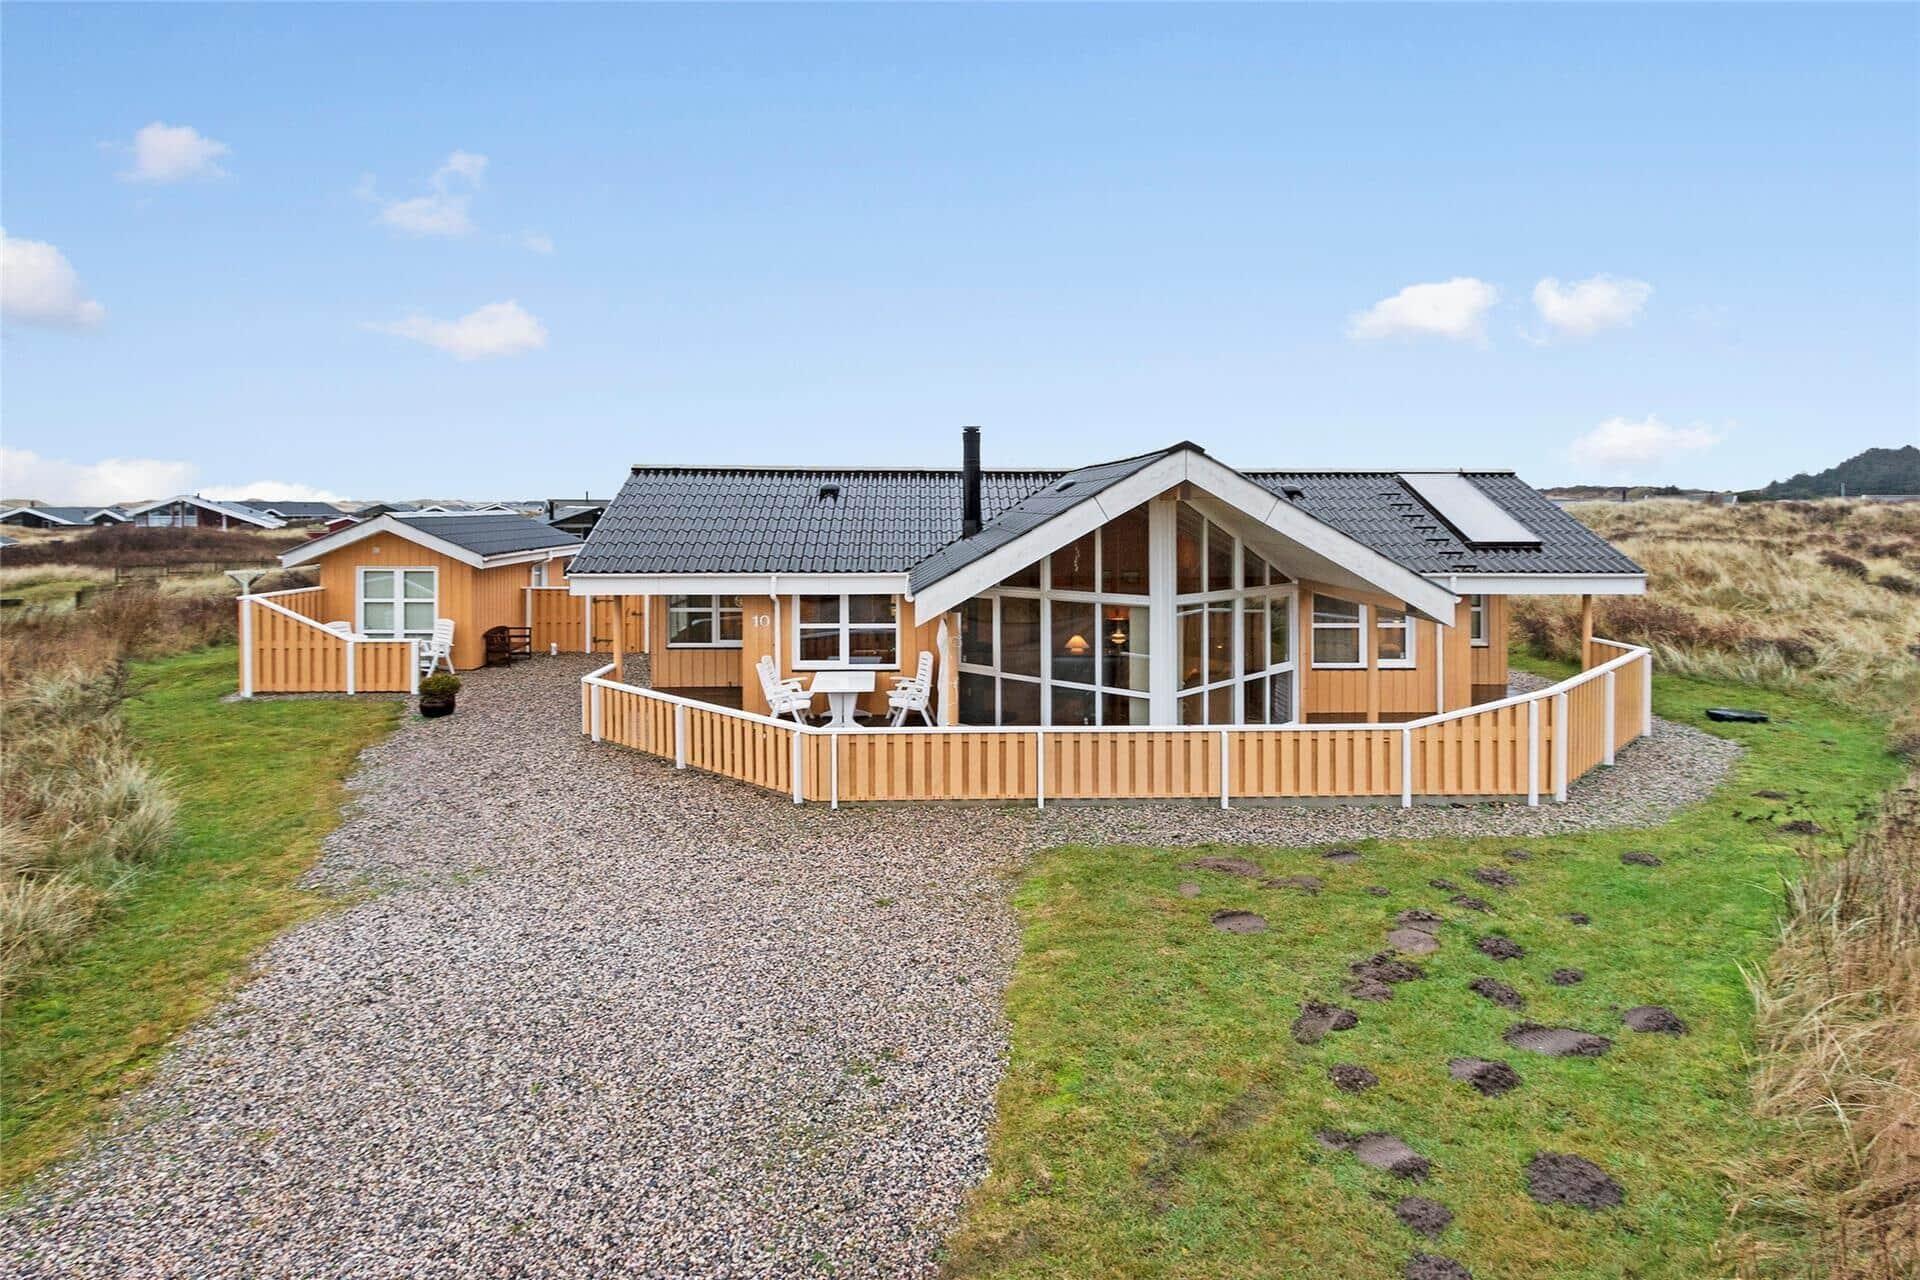 Bild 1-178 Ferienhaus LN508, Klitmarken 10, DK - 9800 Hjørring